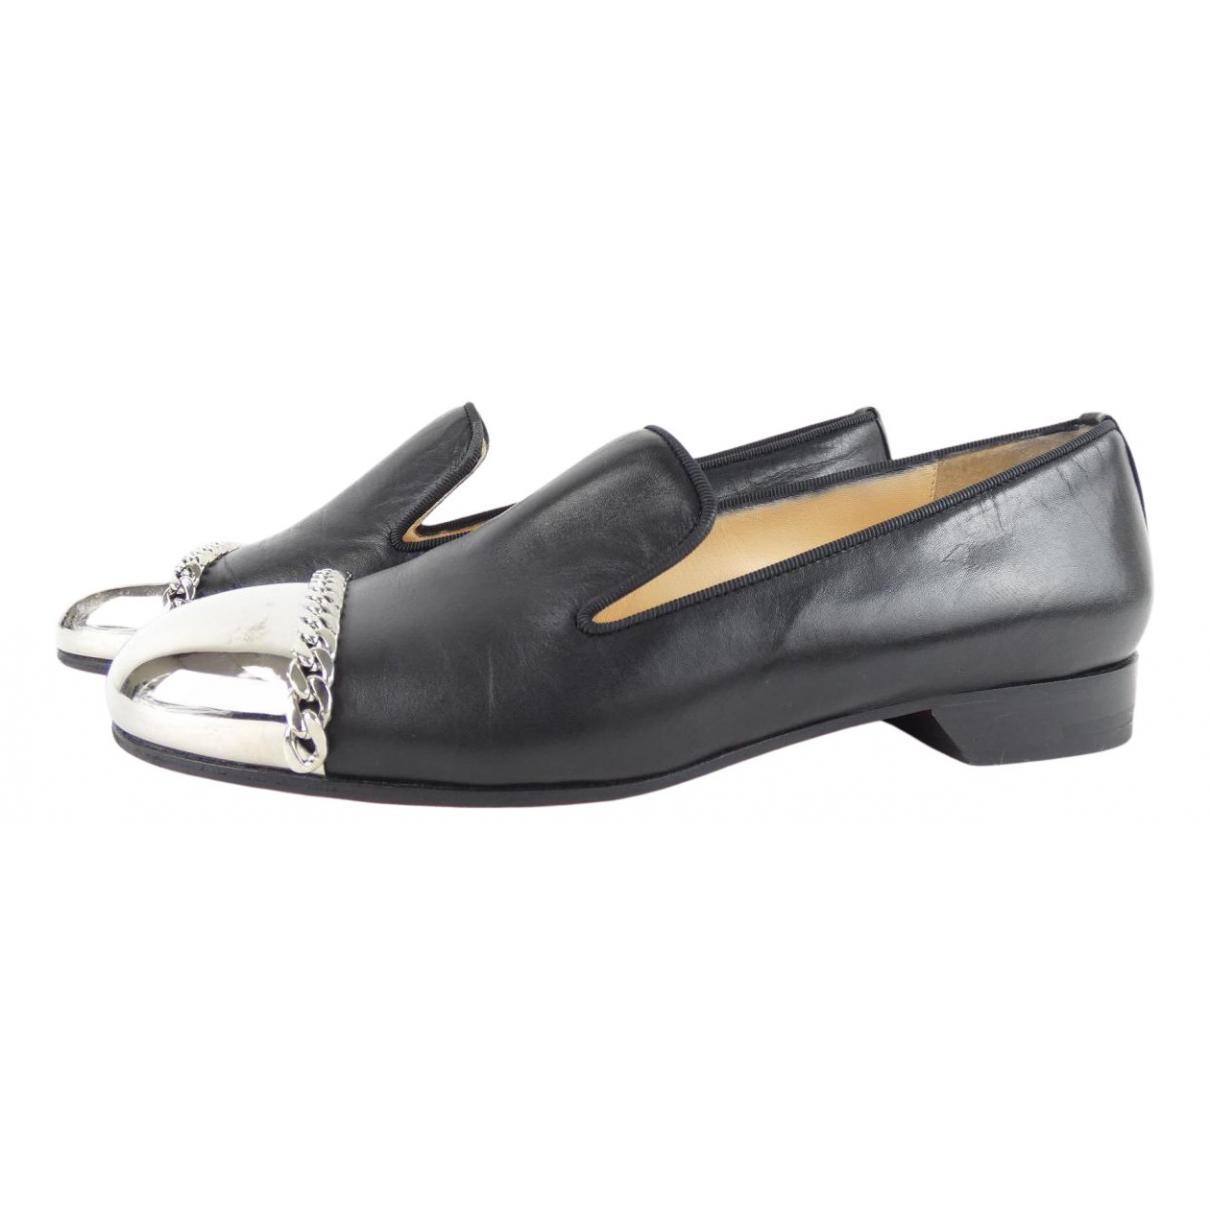 Christian Louboutin N Black Leather Flats for Women 35 EU